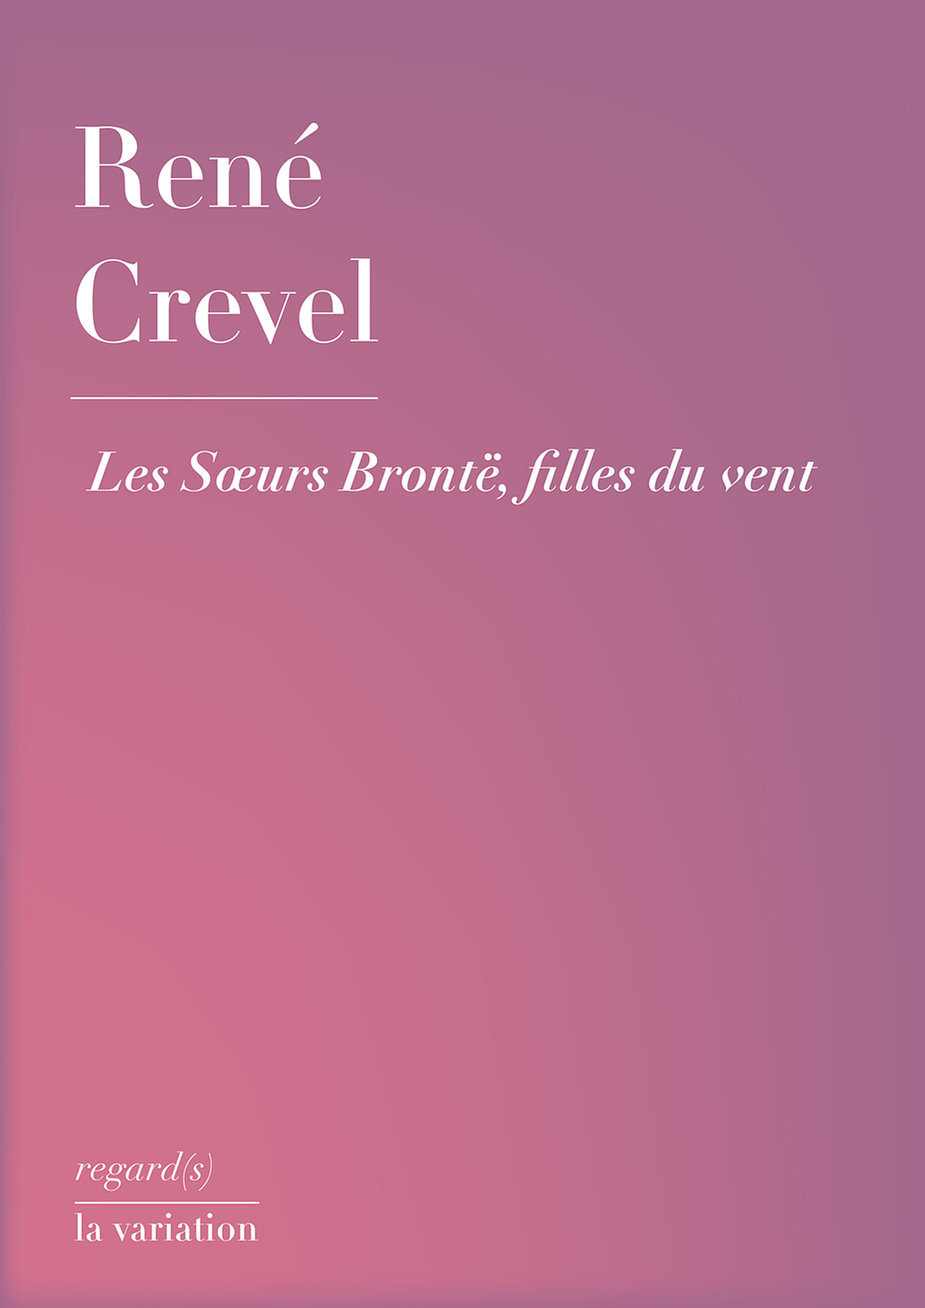 R. Crevel, Les Sœurs Brontë filles du vent